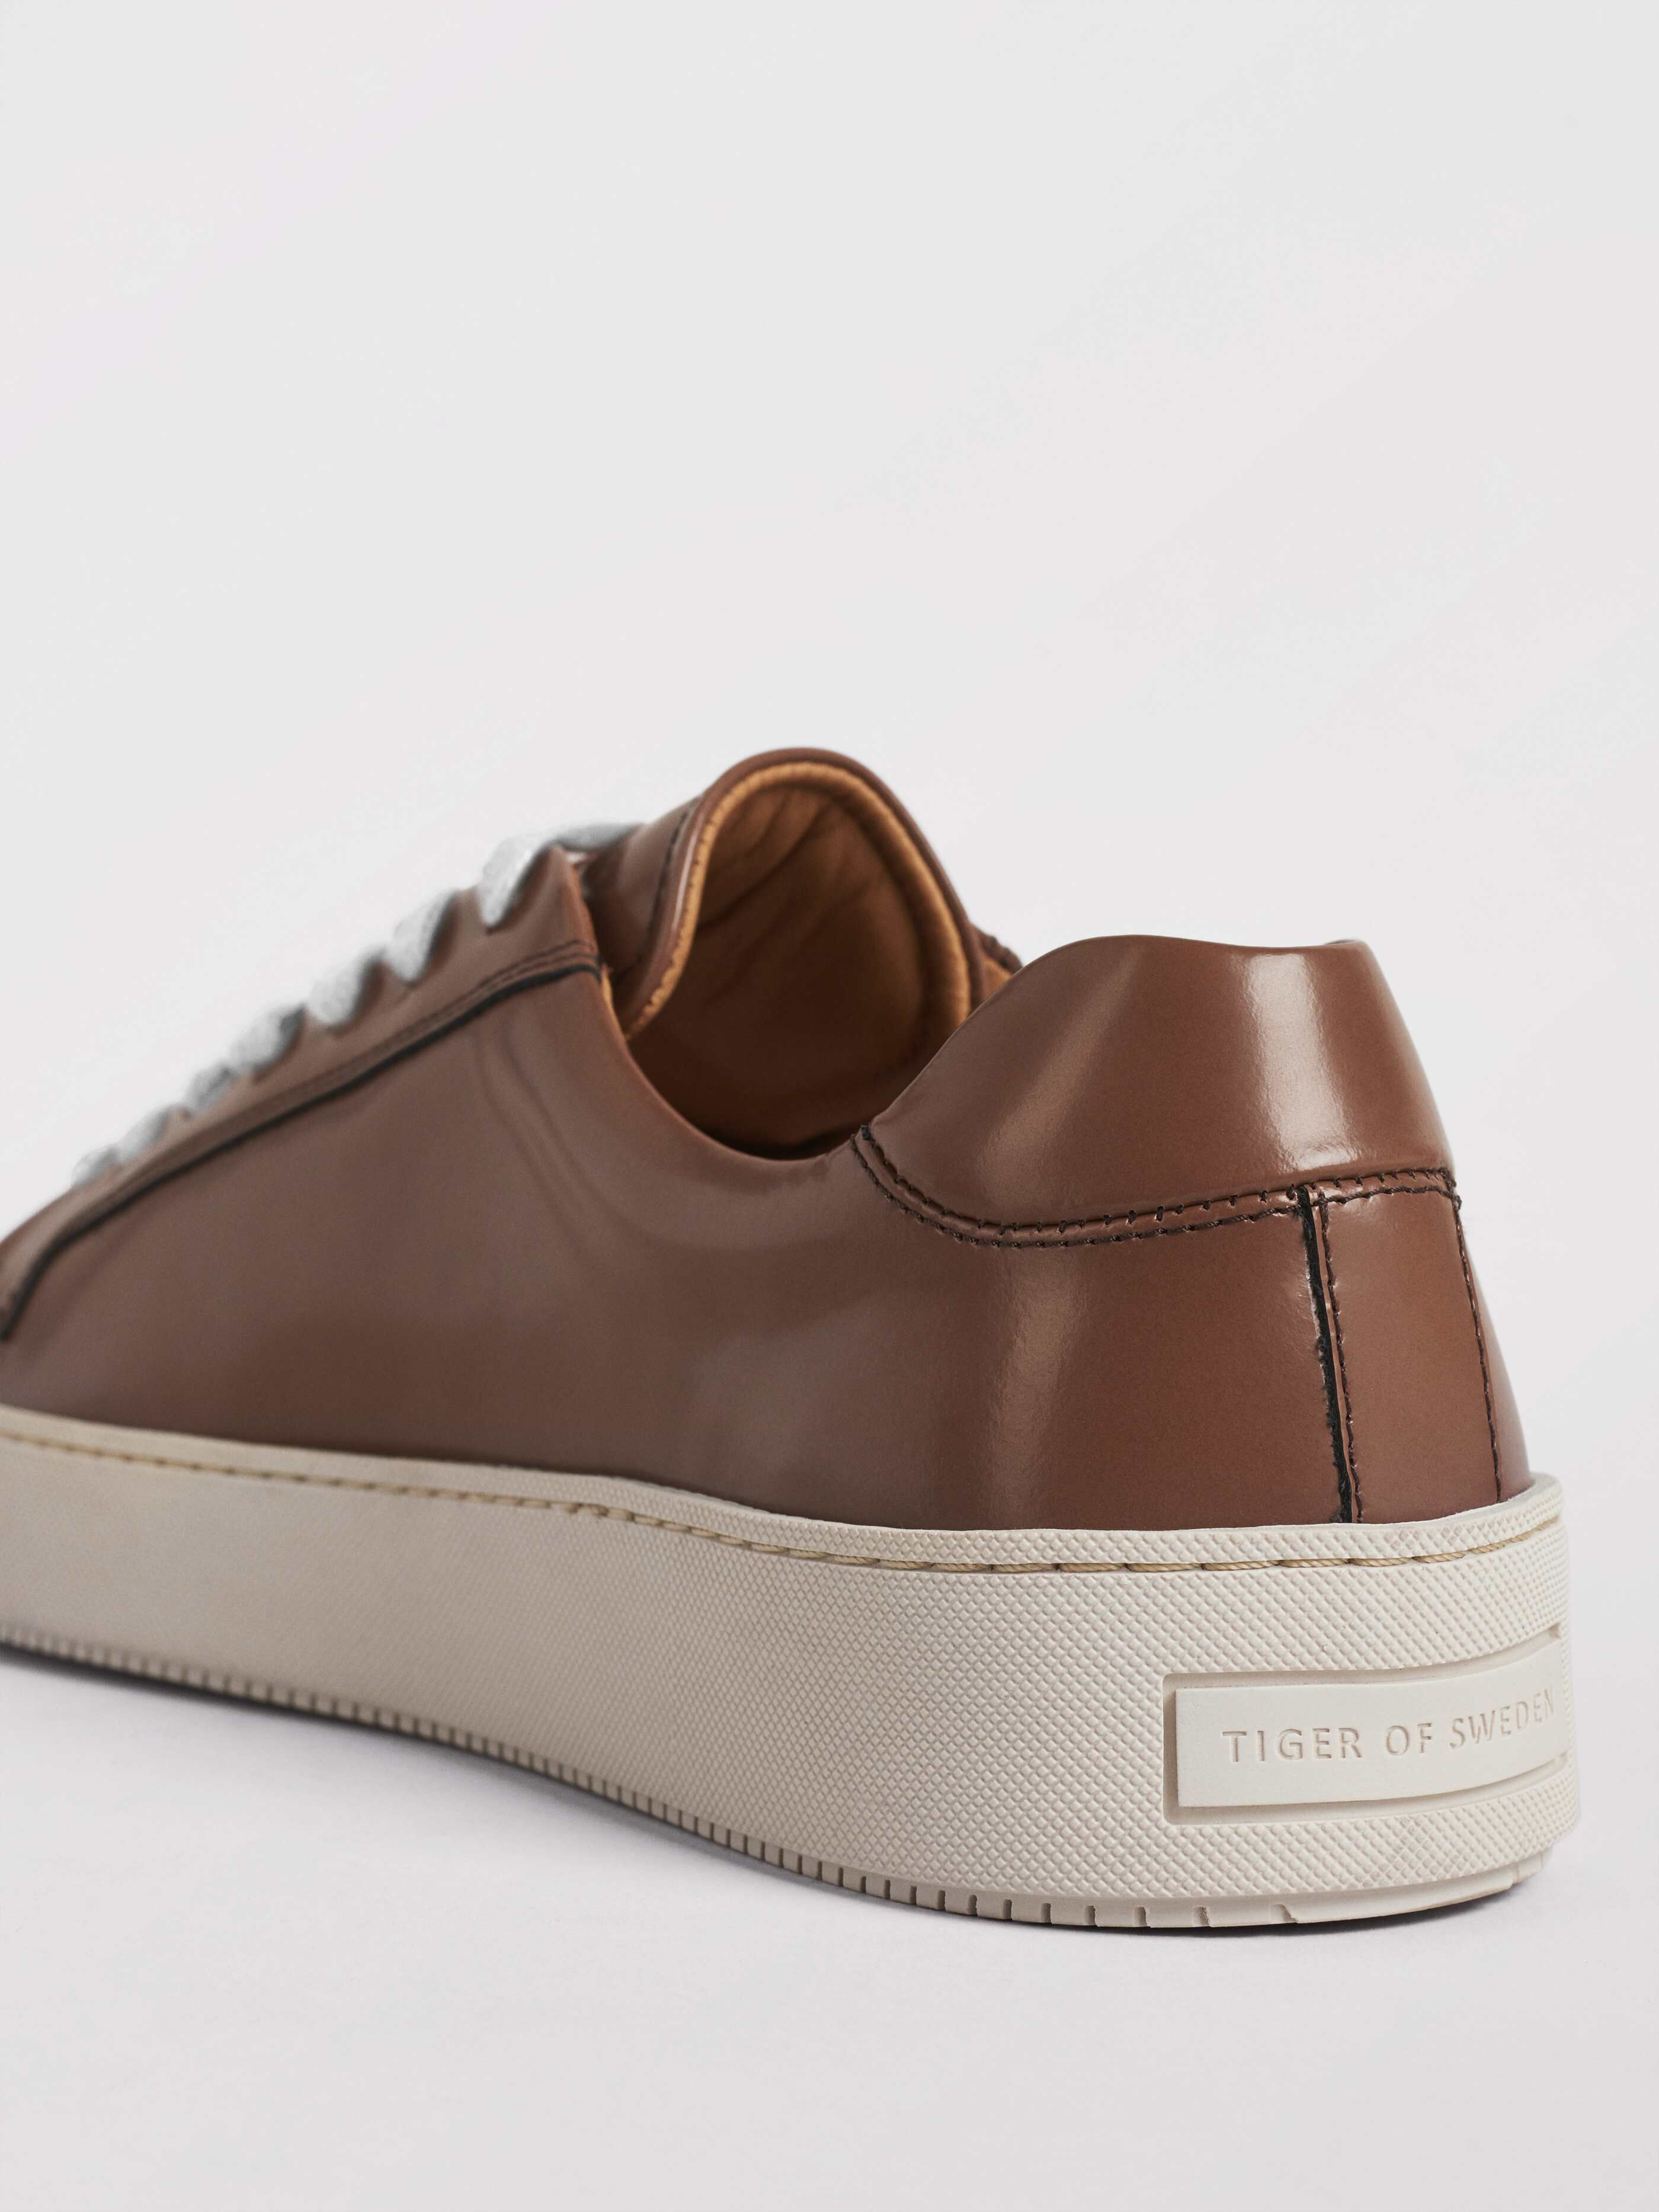 tiger of sweden sneakers